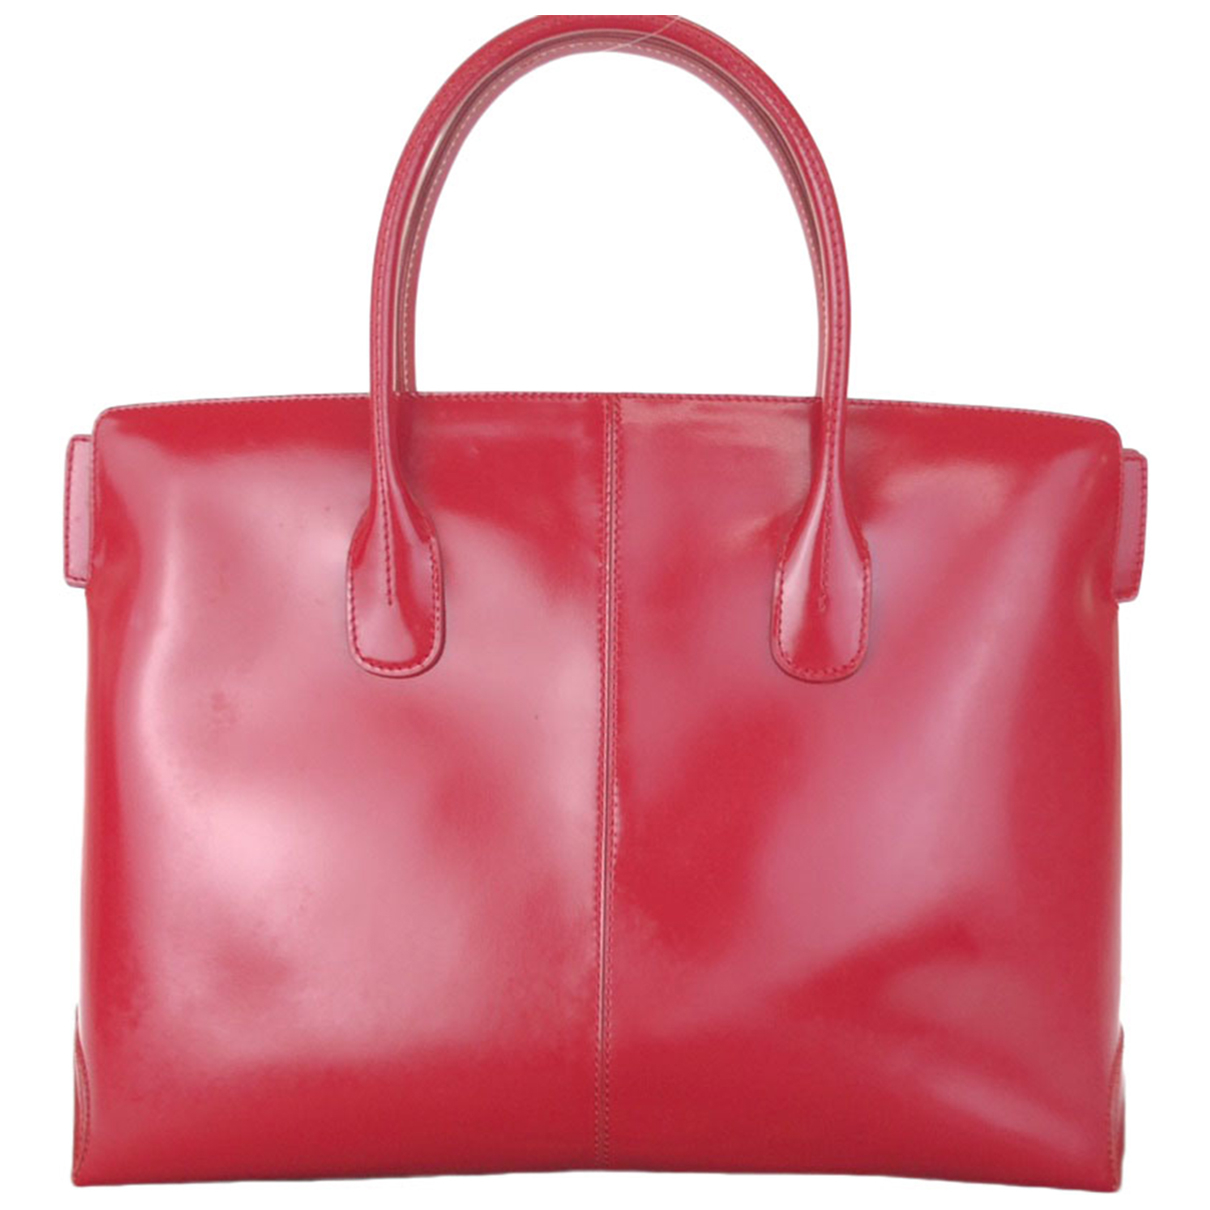 Tod's \N Patent leather handbag for Women \N